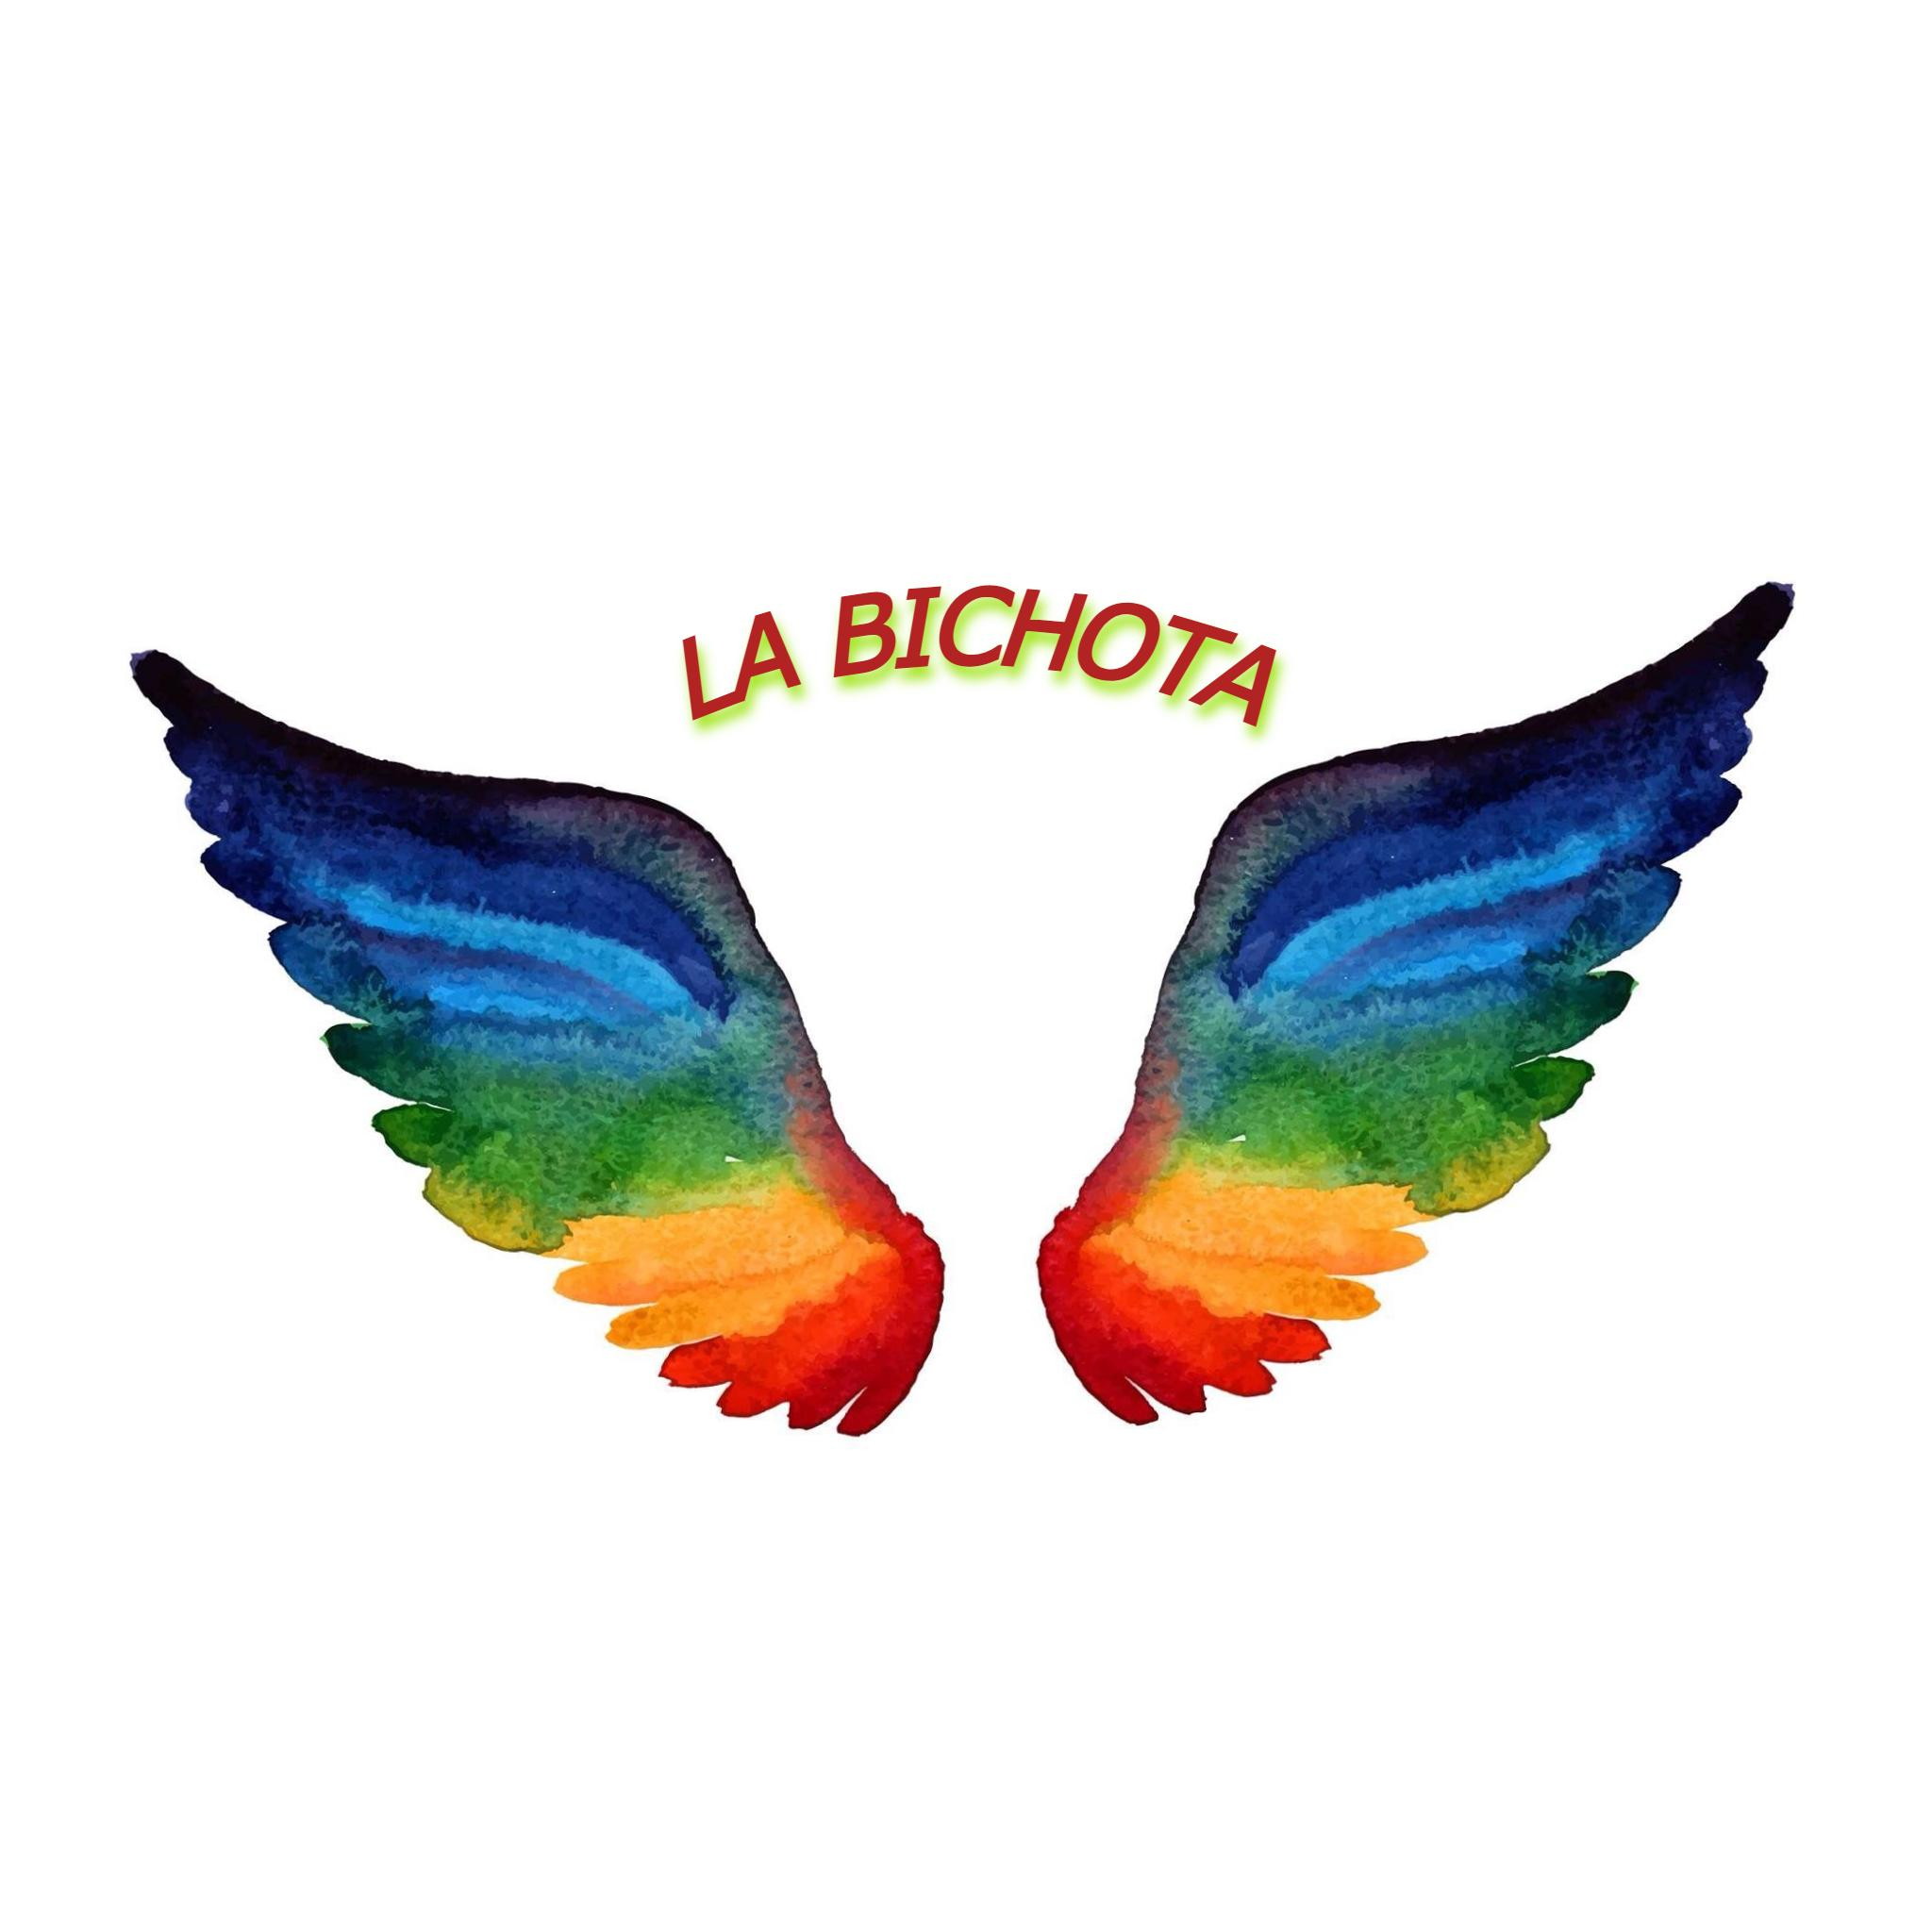 La bichota?s=0nt6hz8qgtykkuvf73mowwipcil8zeuagusuzv+x3hw=